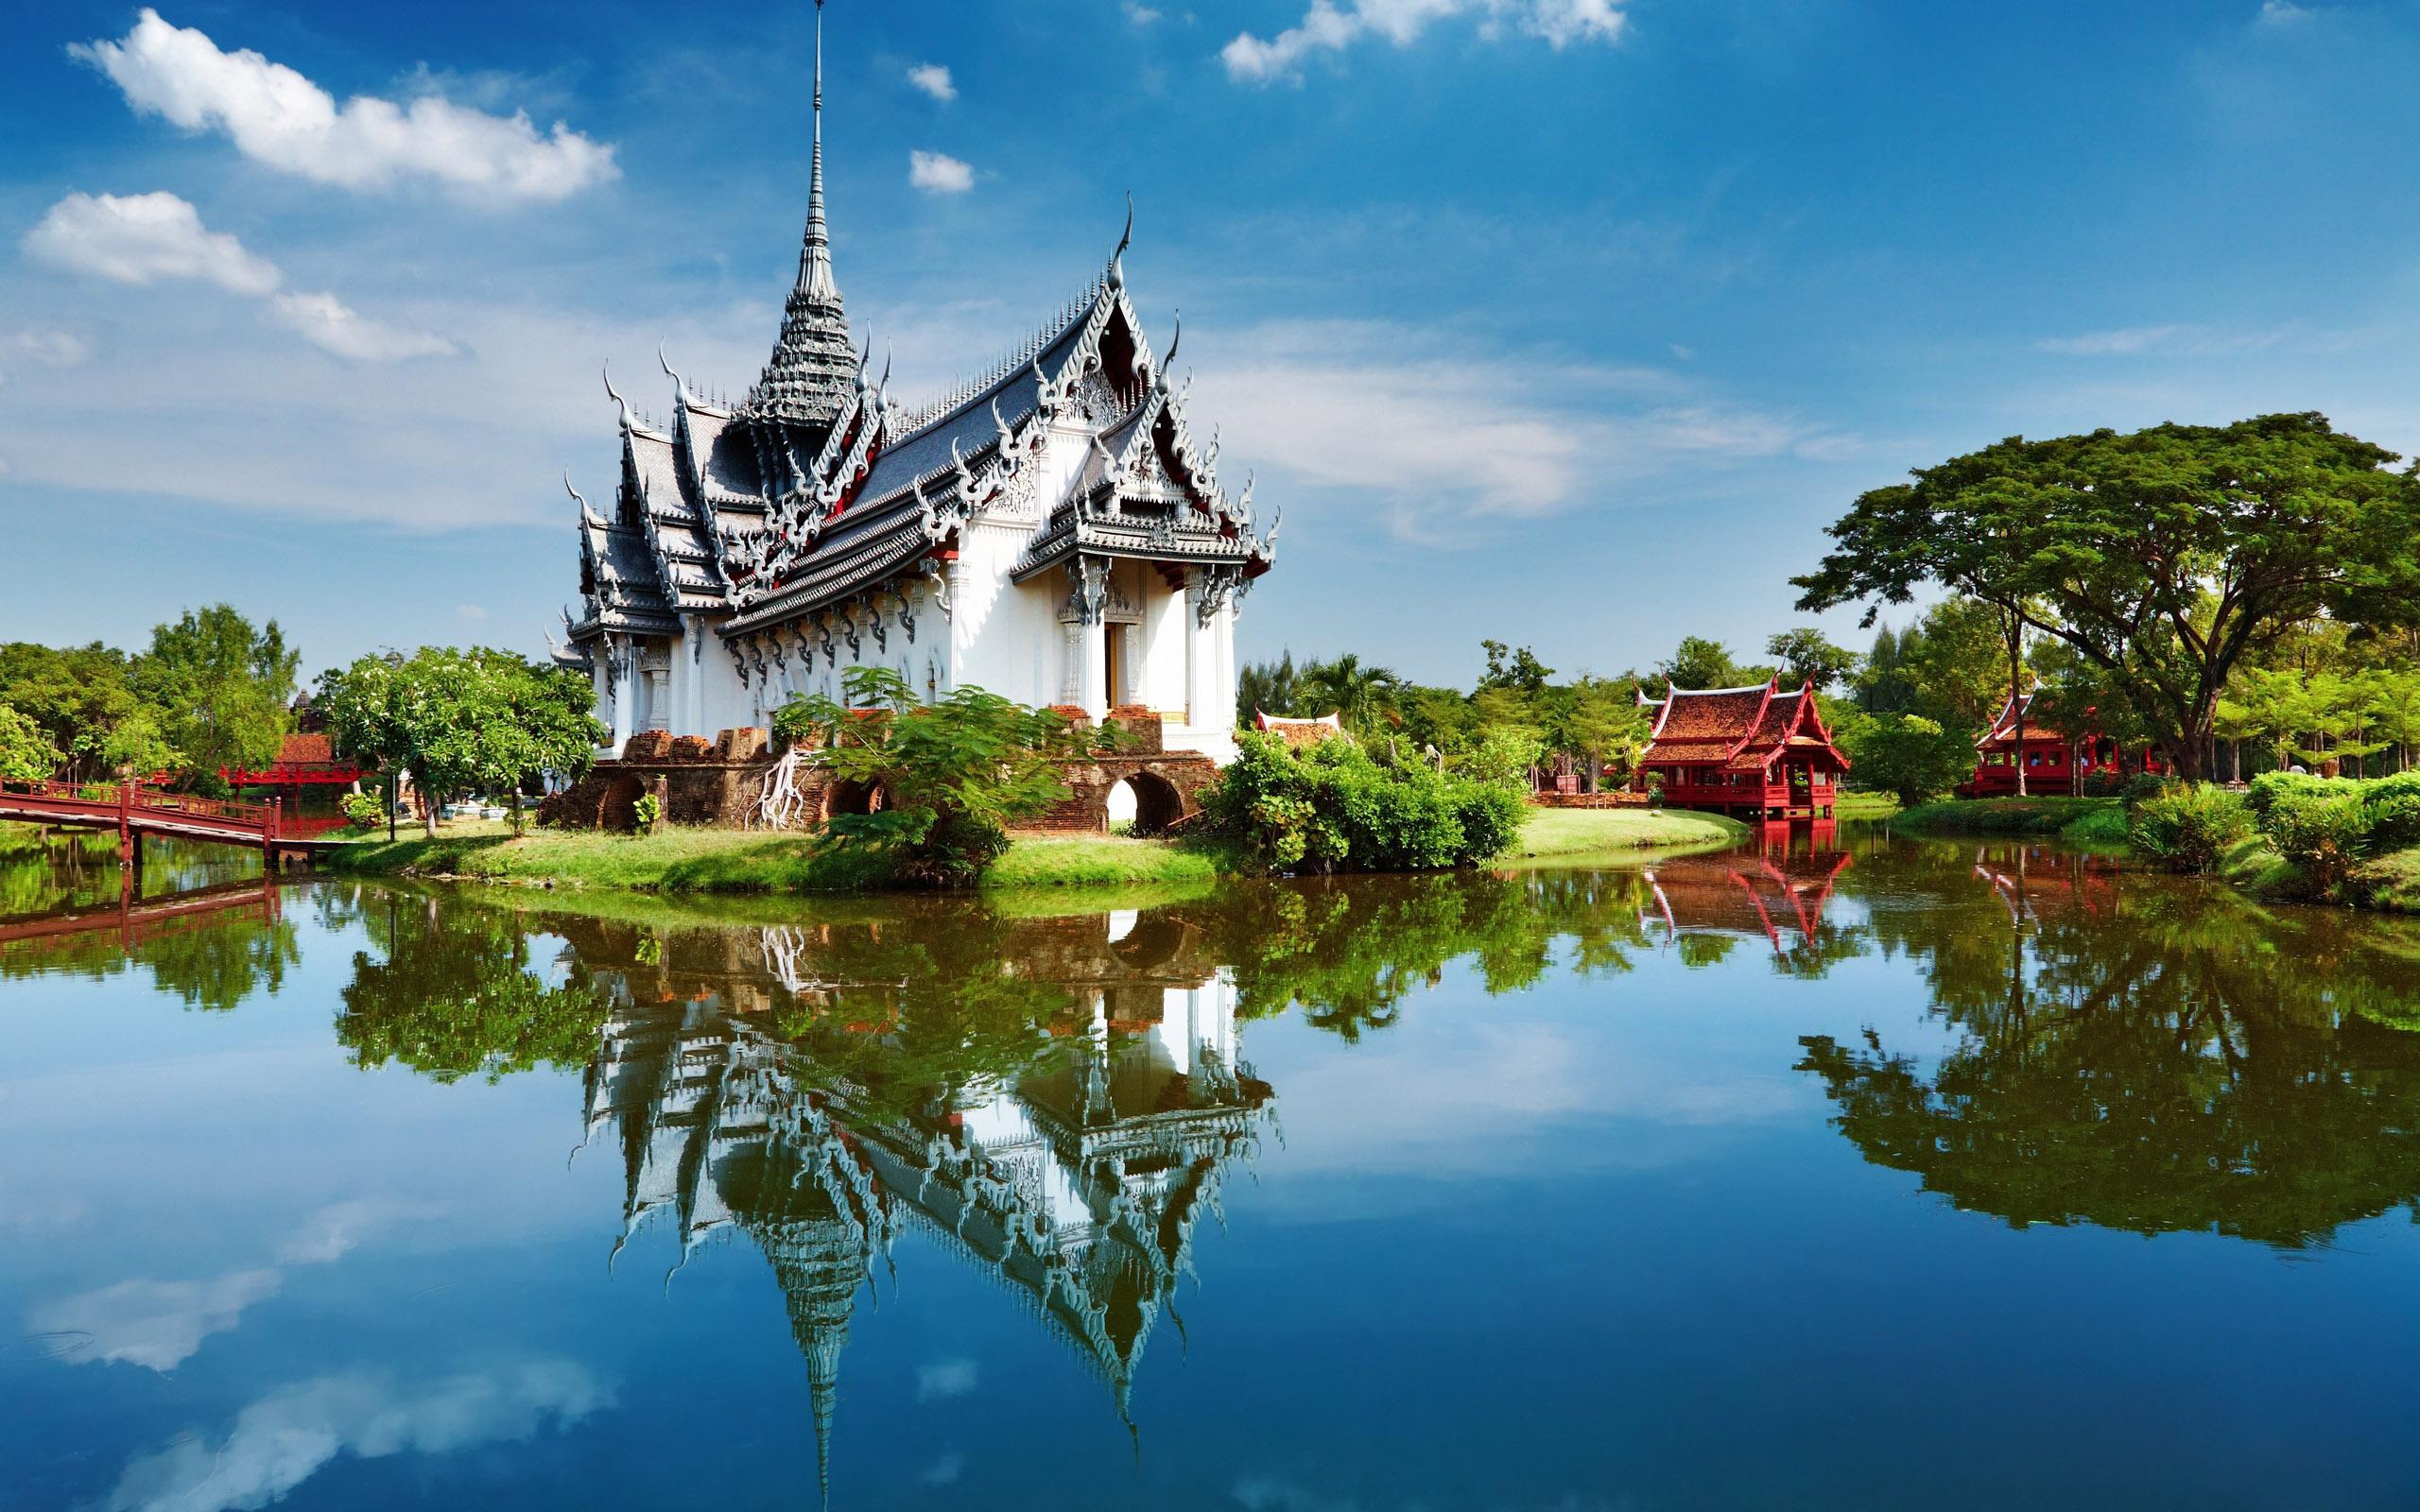 40 units of Thailand Wallpaper